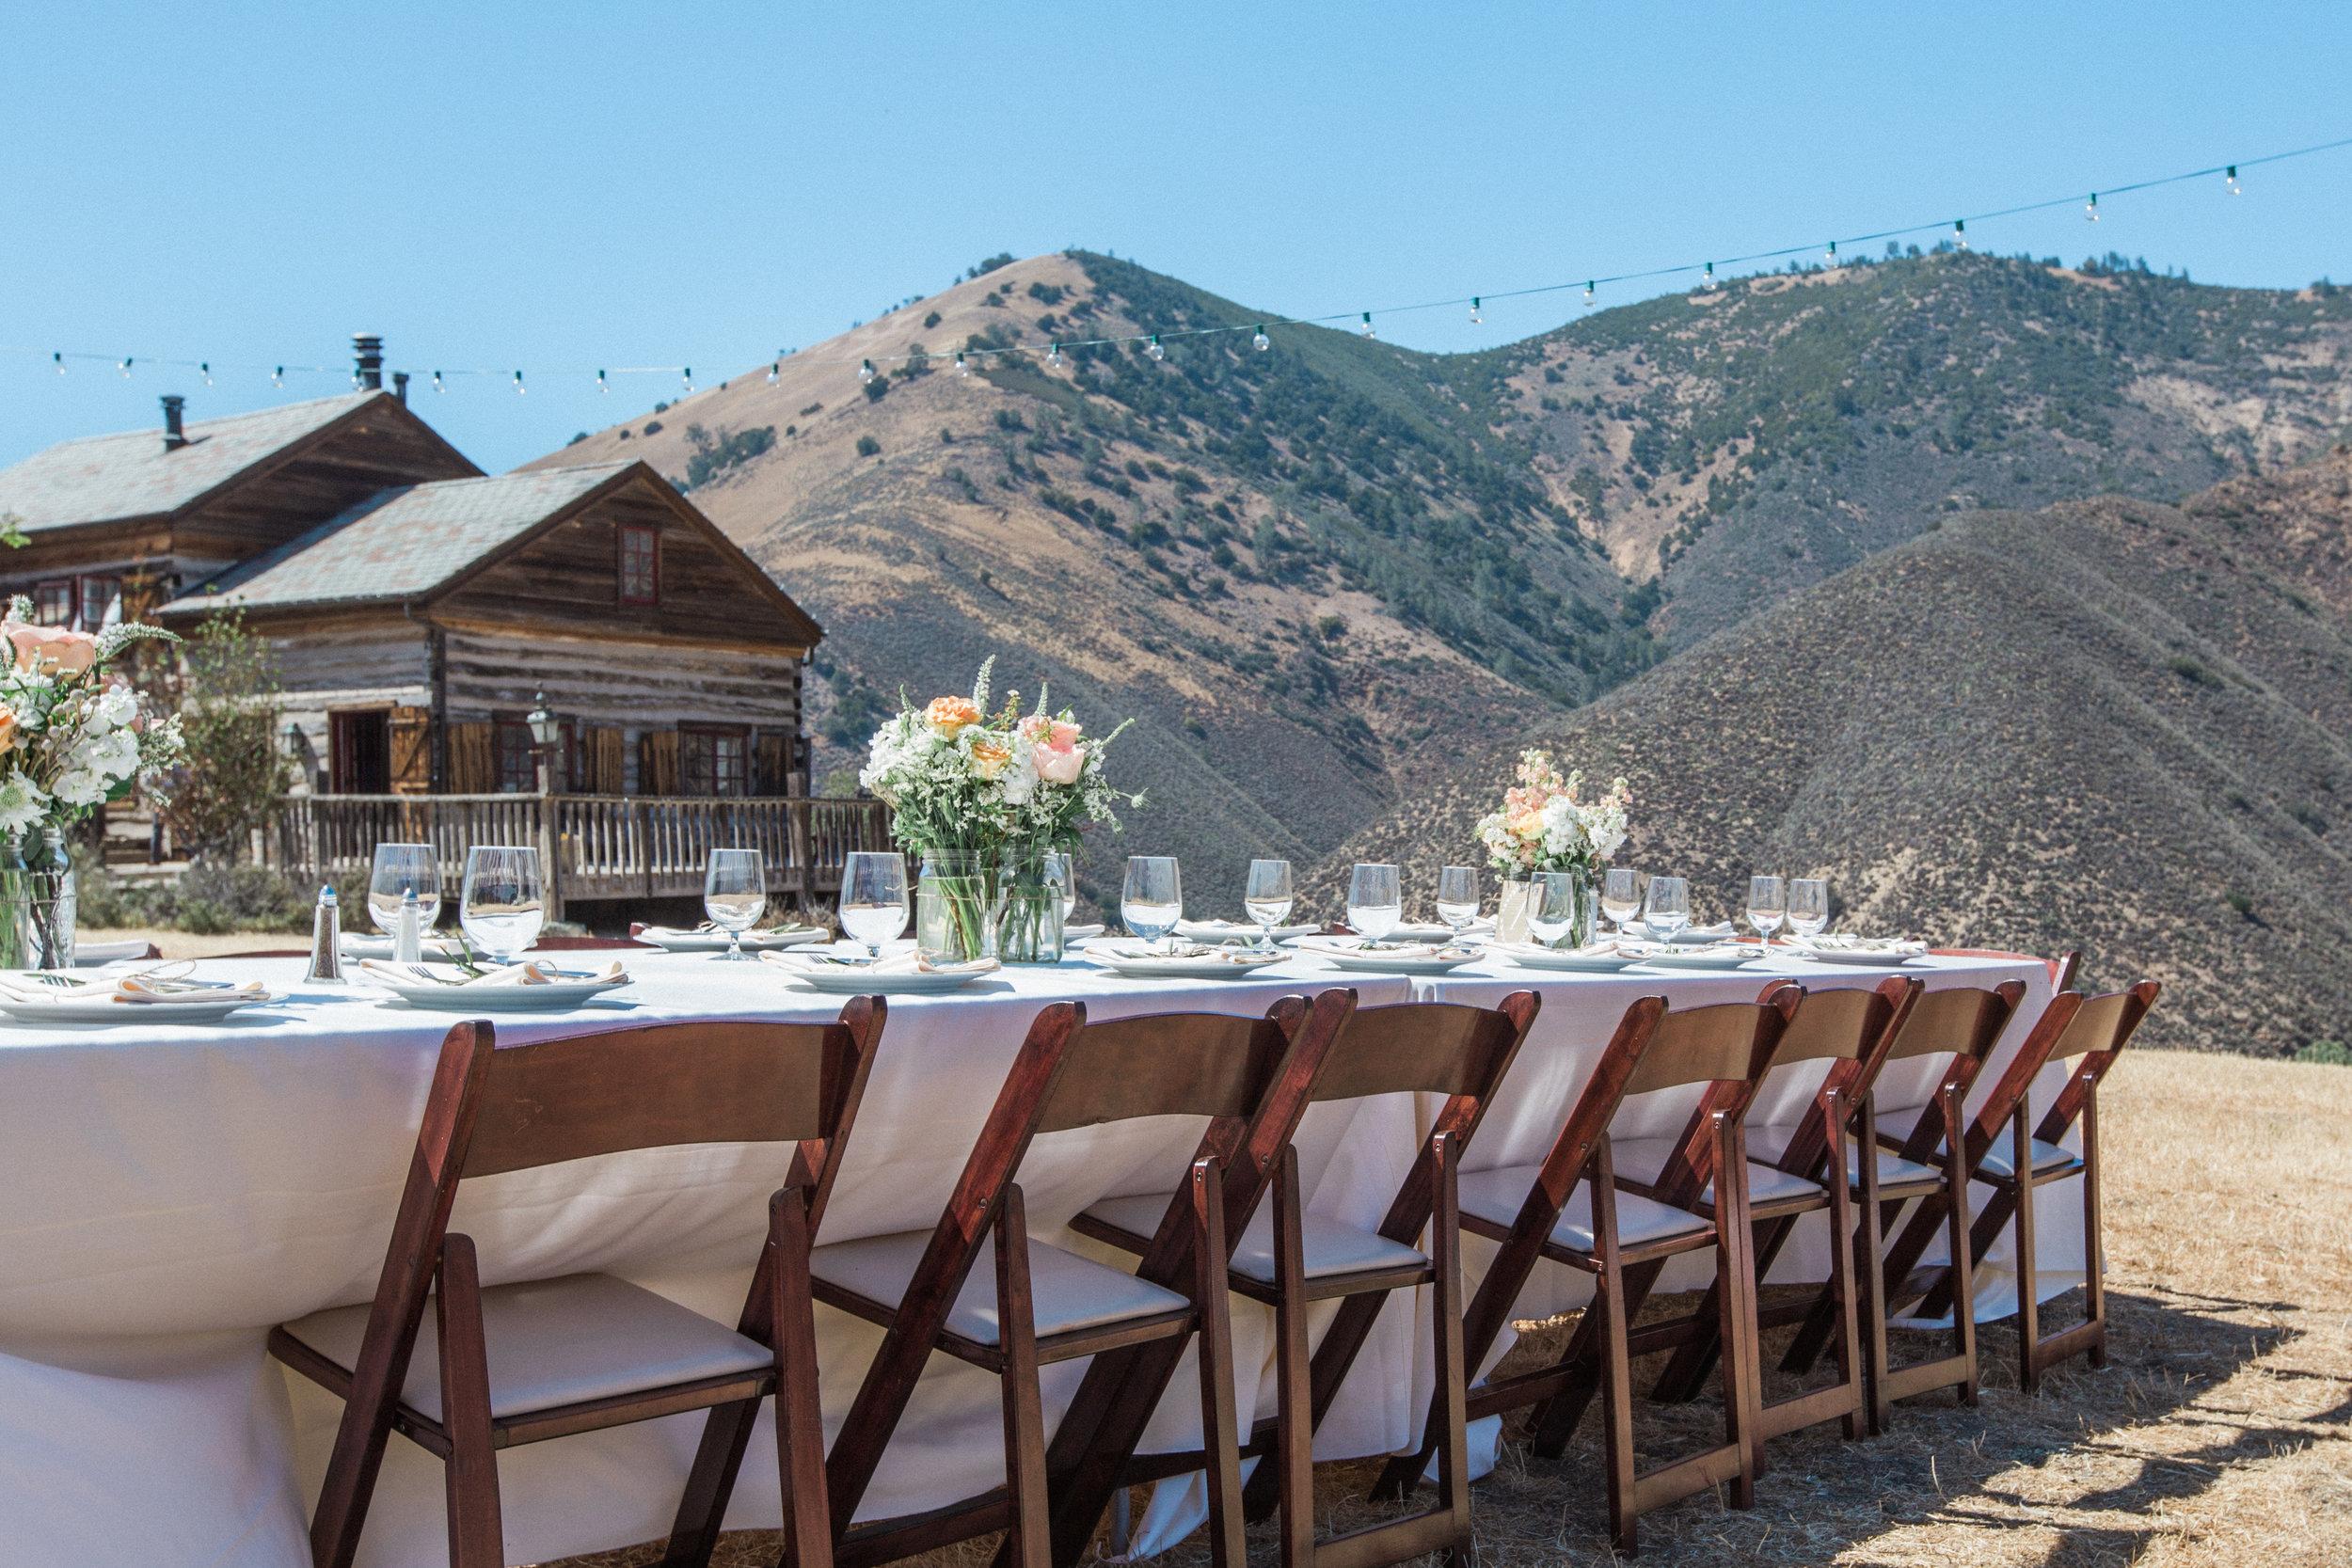 www.santabarbarawedding.com | Kiel Rucker Photography | Joelle Charming Wedding Planner | Figueroa Mountain Farmhouse | La Tavola Linens | Ella & Louie Flowers